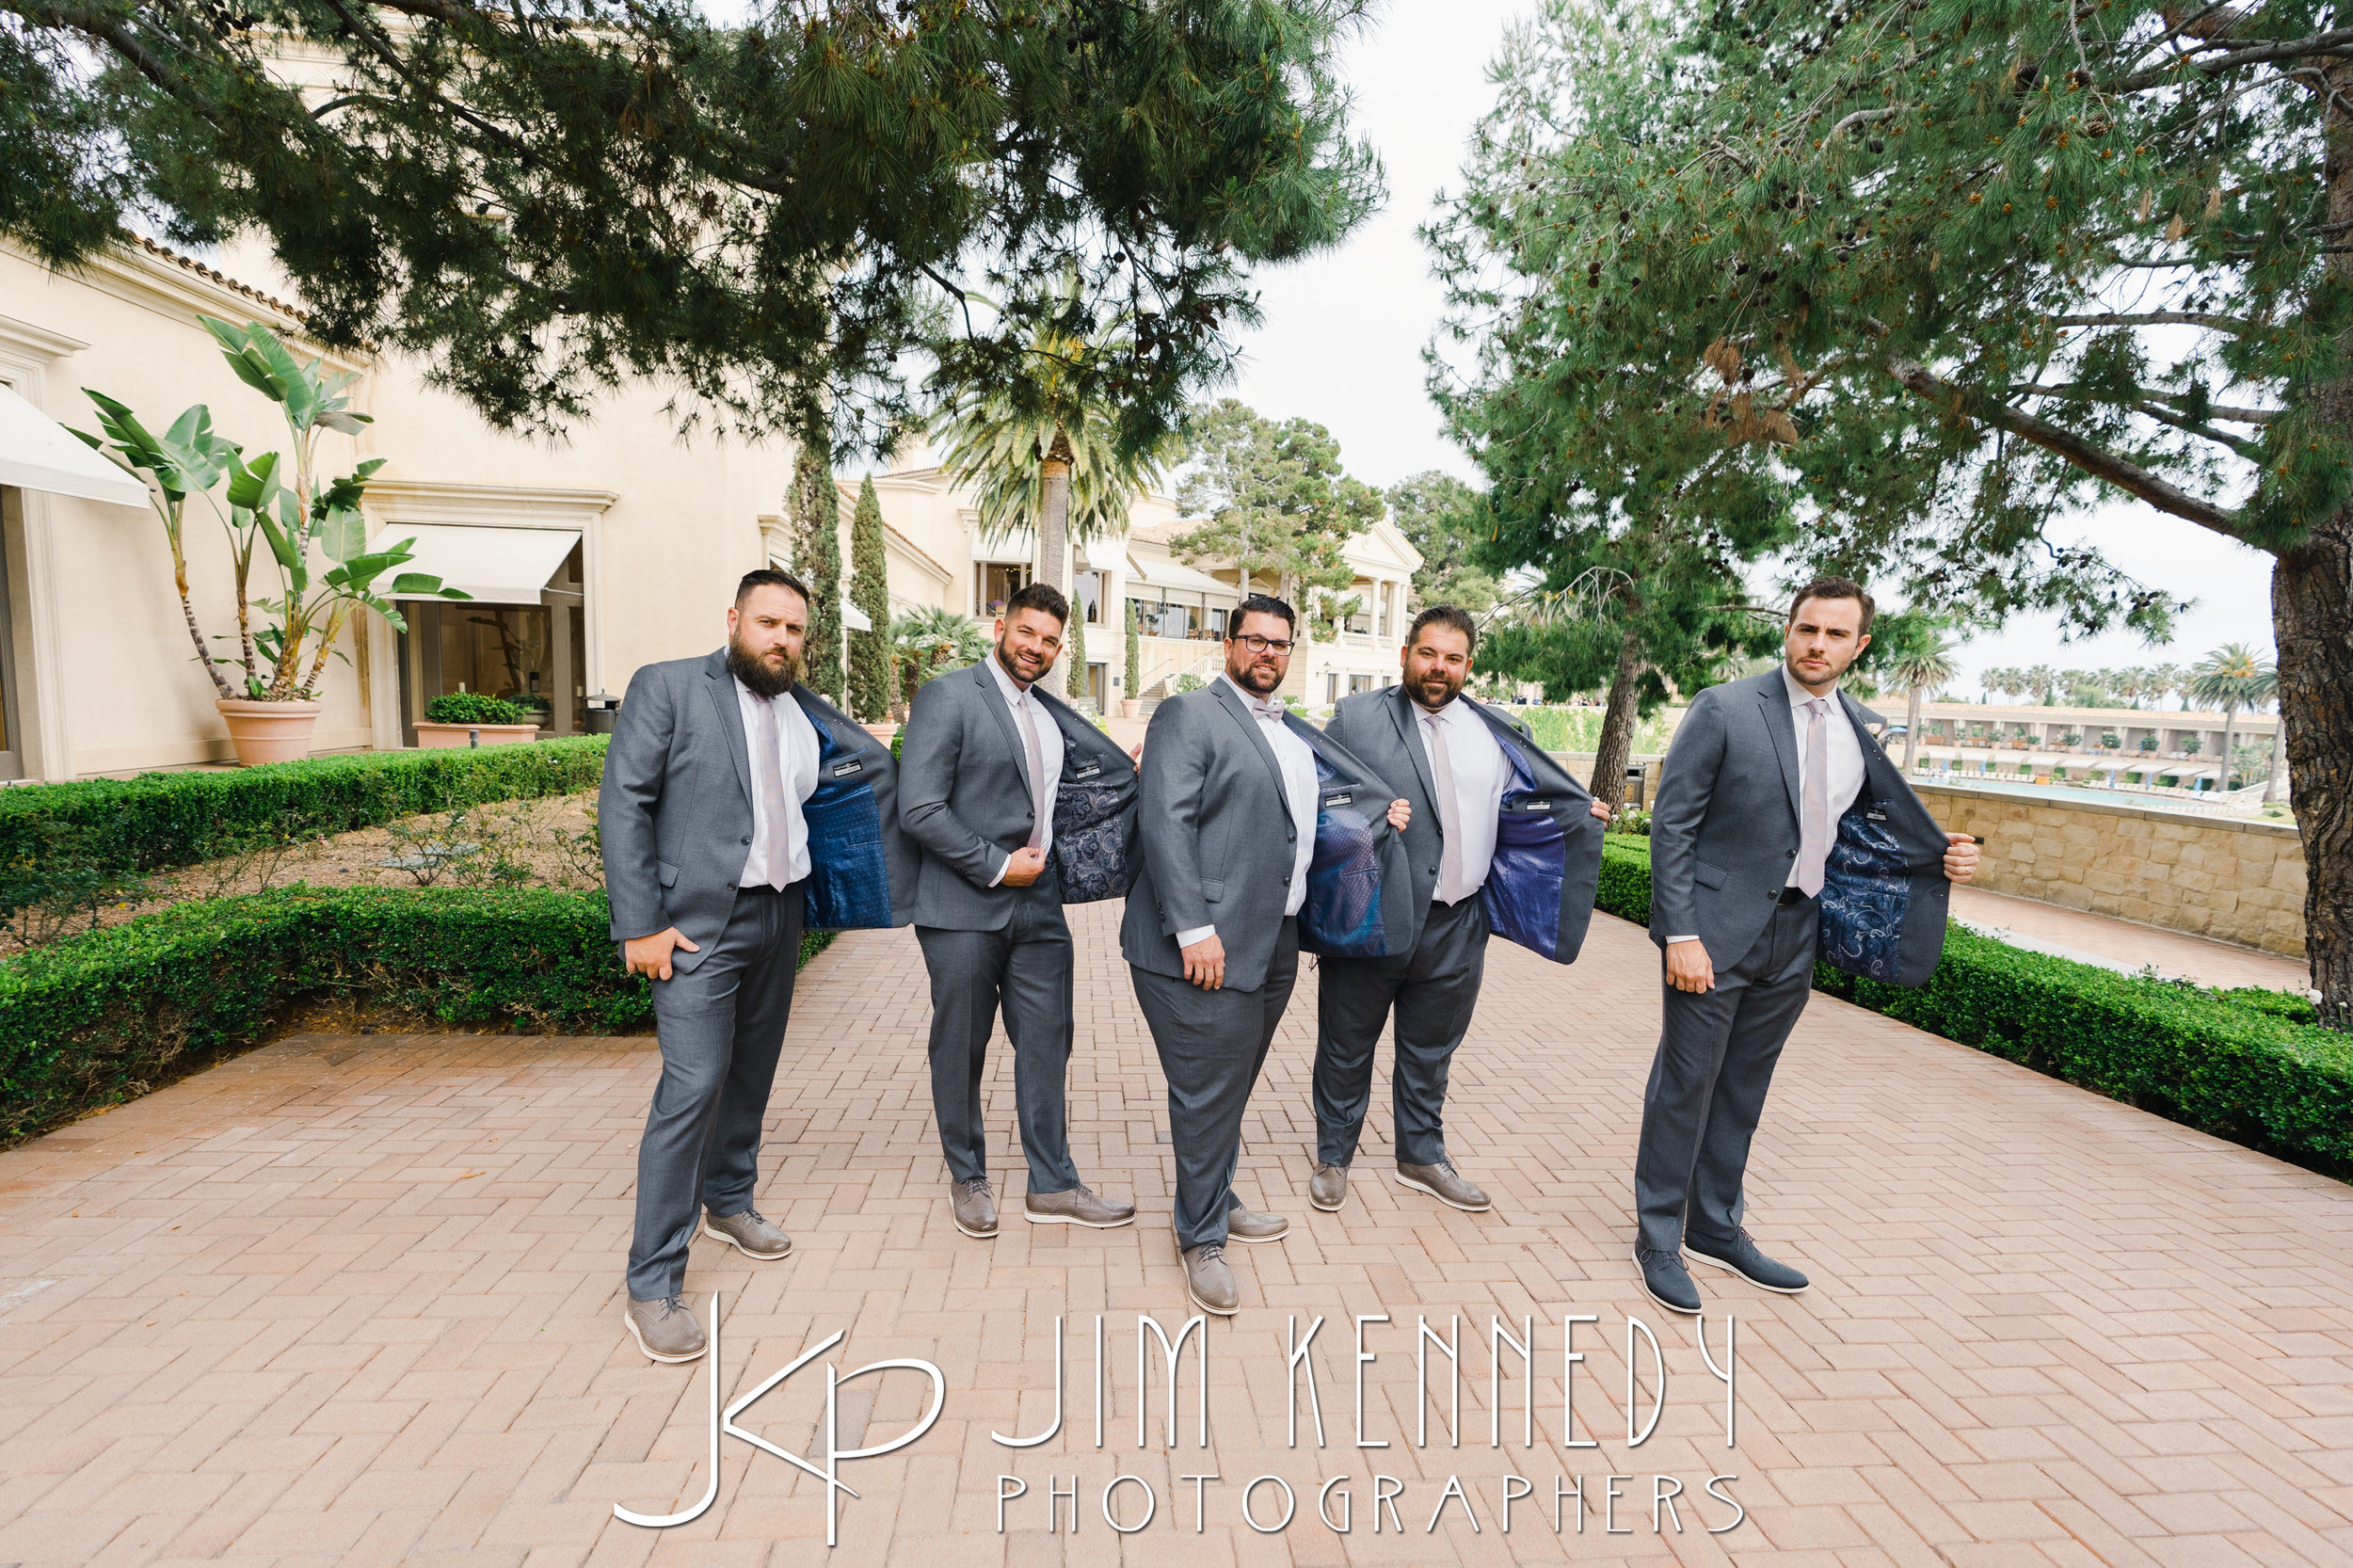 pelican-hill-wedding-jim-kenedy-photographers_0085.JPG